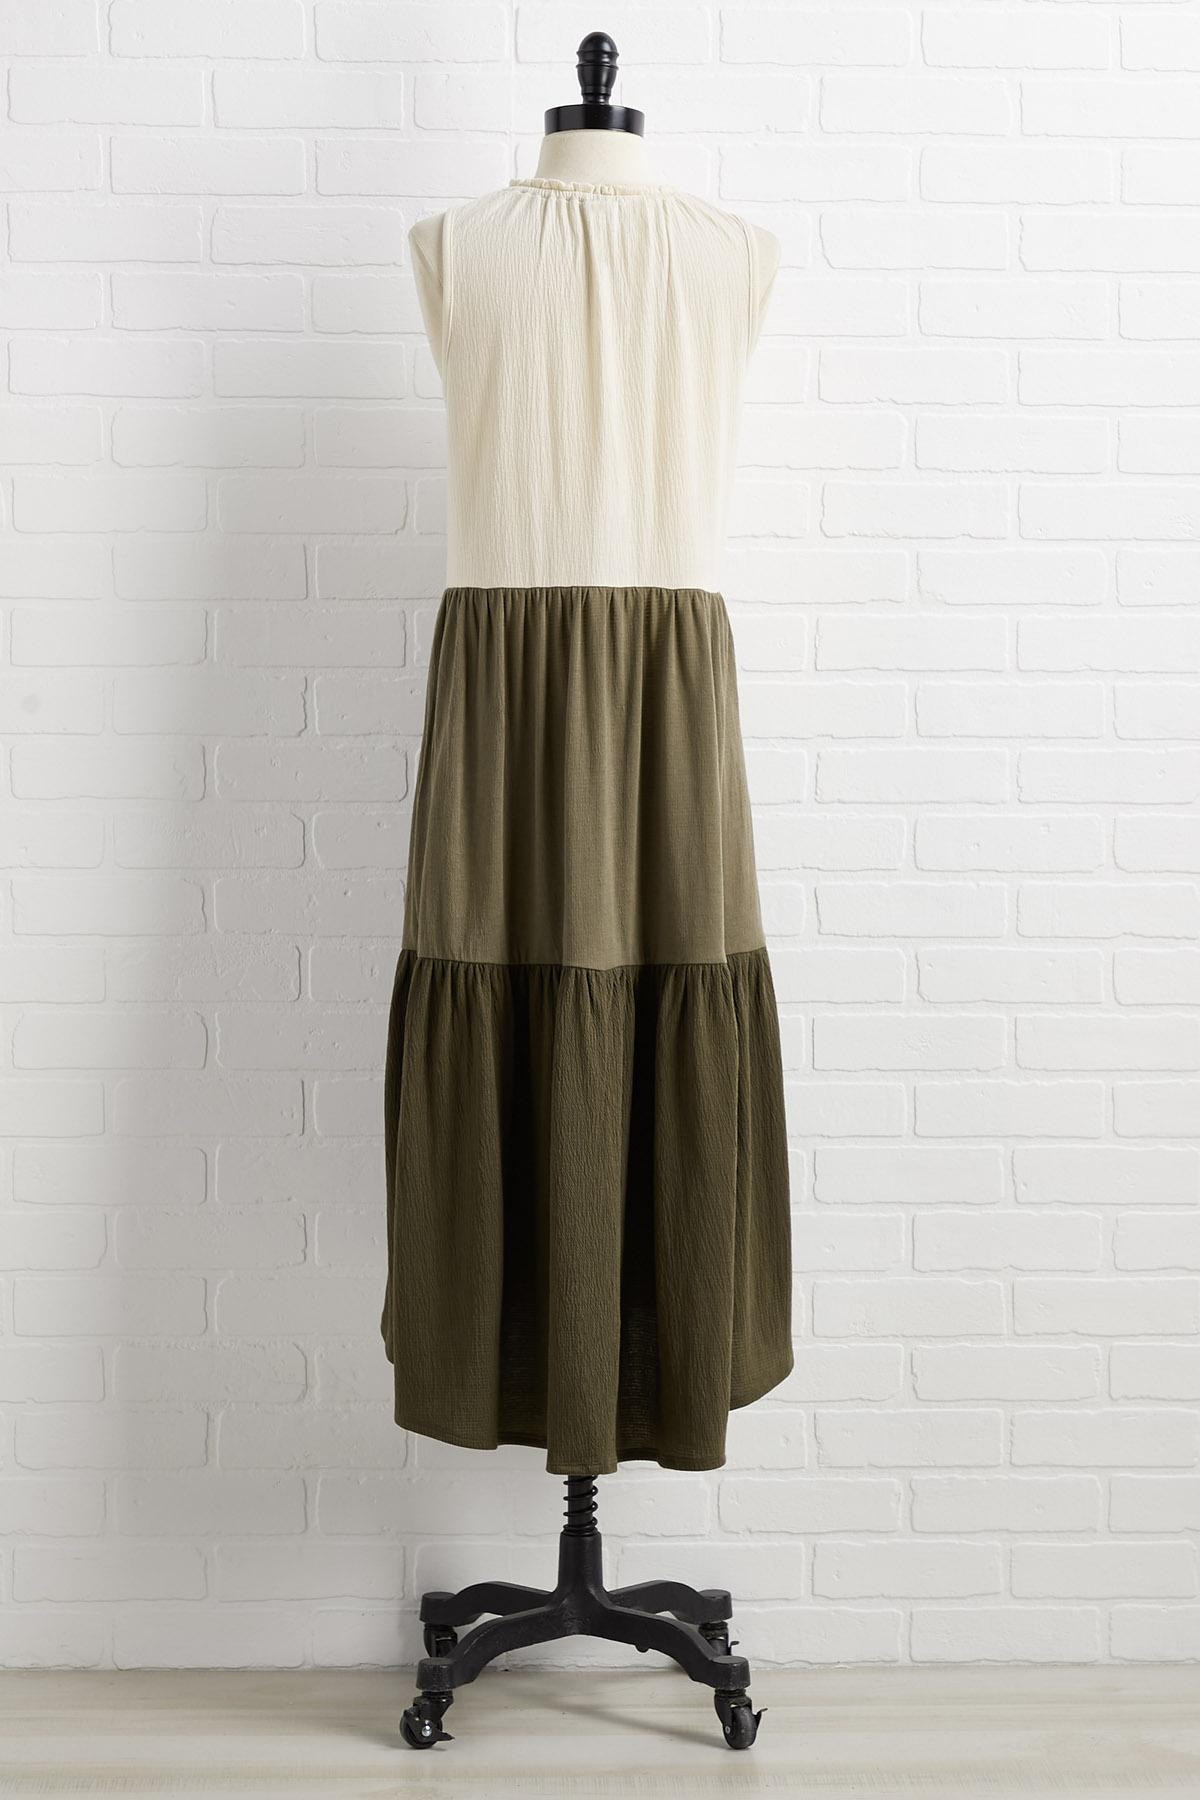 Shades Of Green Dress